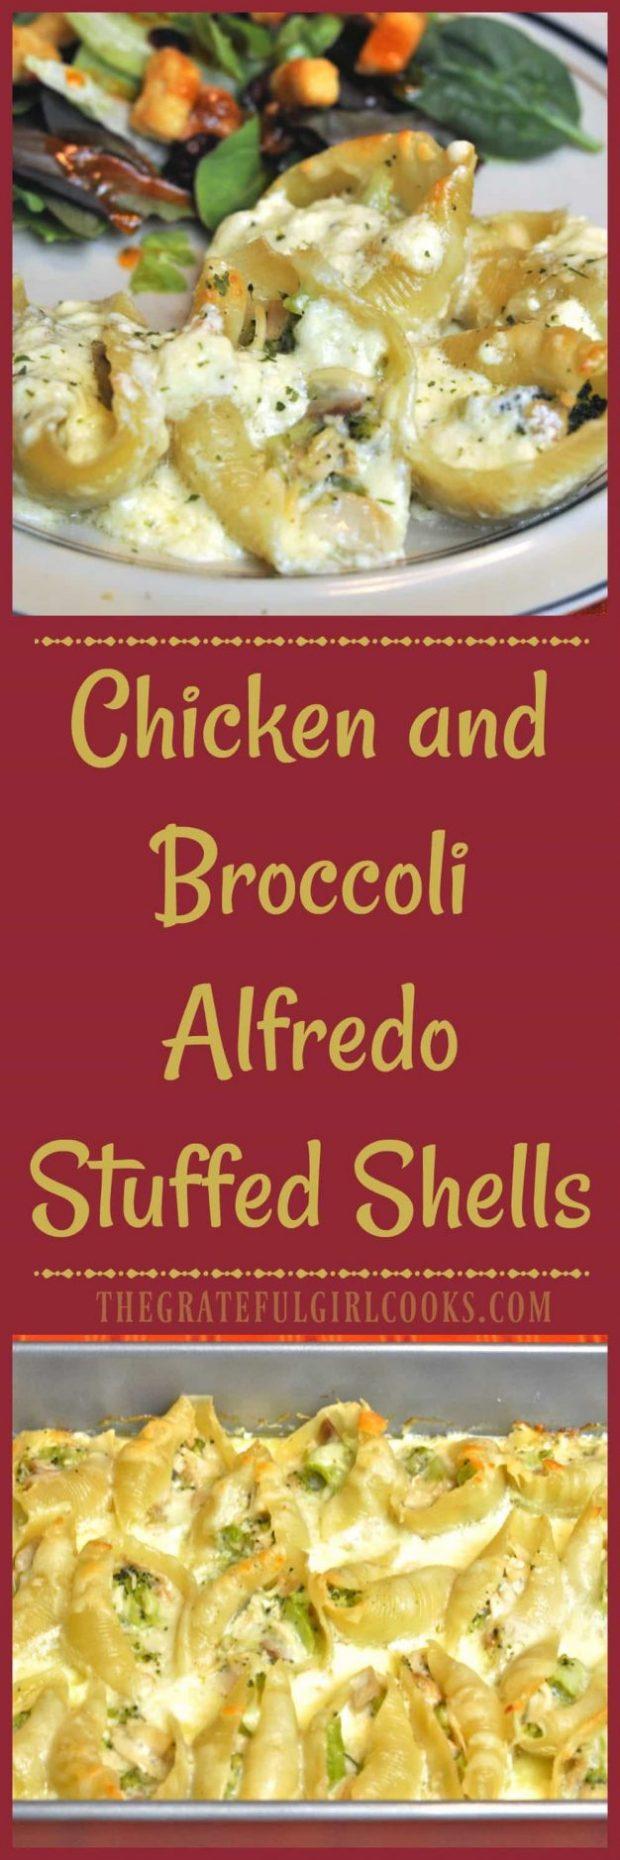 Chicken and Broccoli Alfredo Stuffed Shells / The Grateful Girl Cooks!